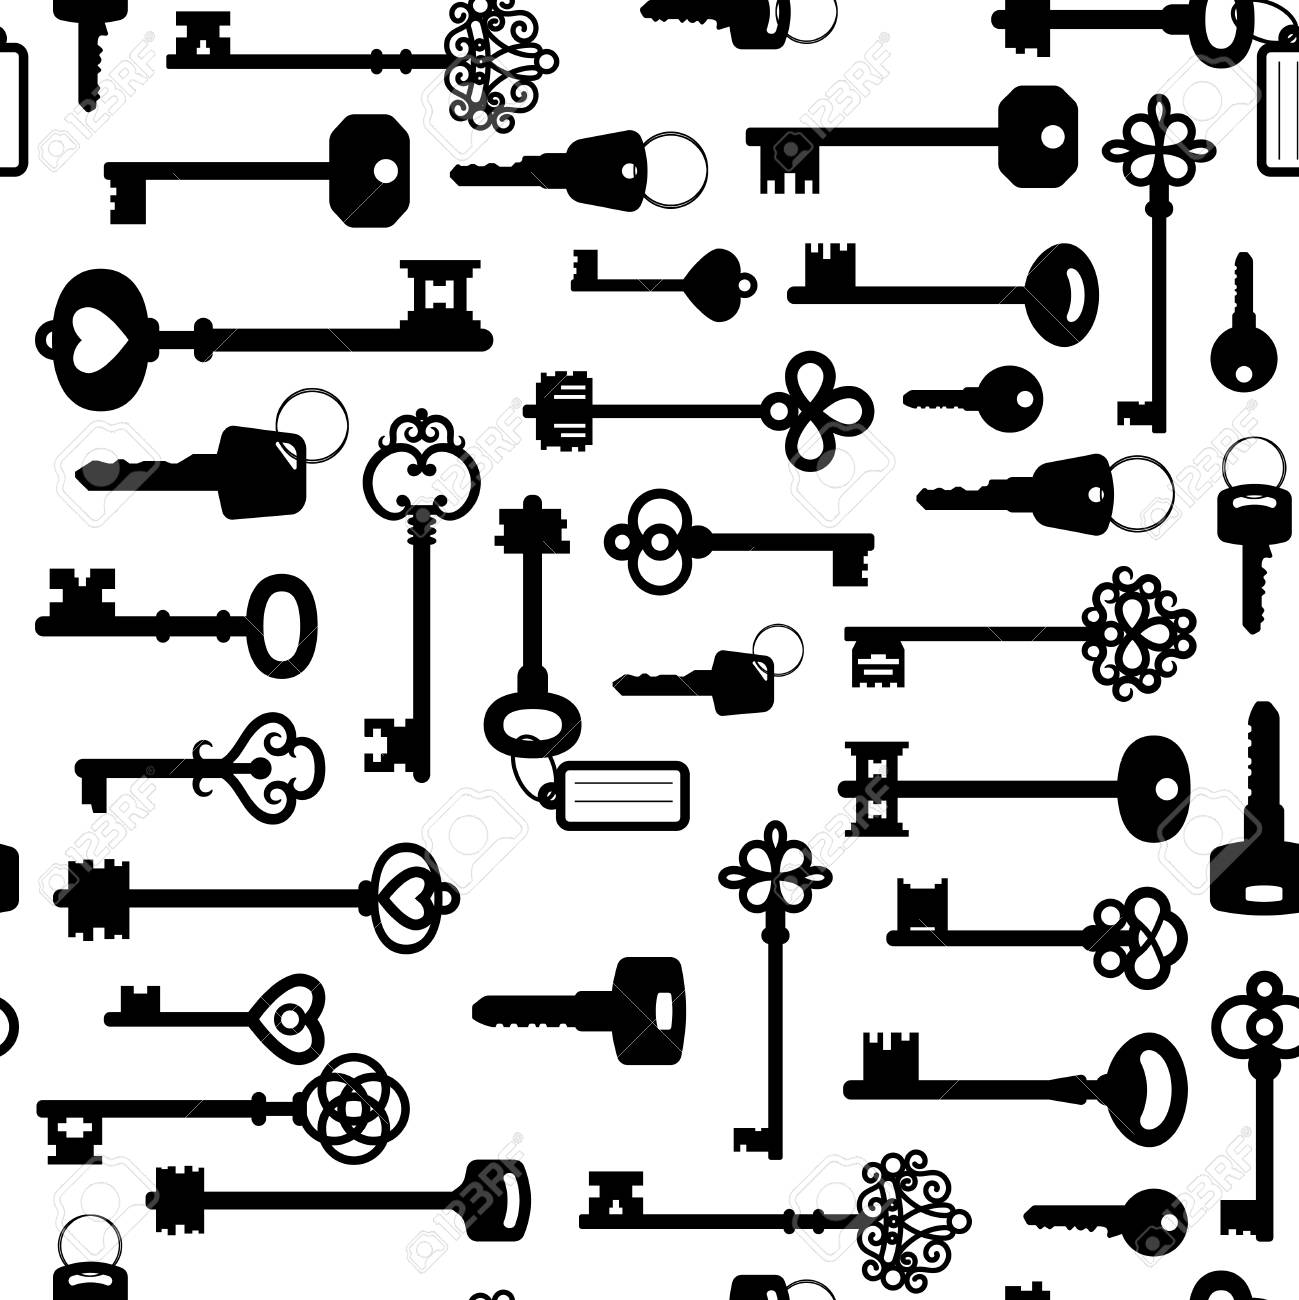 Black and white keys seamless pattern - 89775914